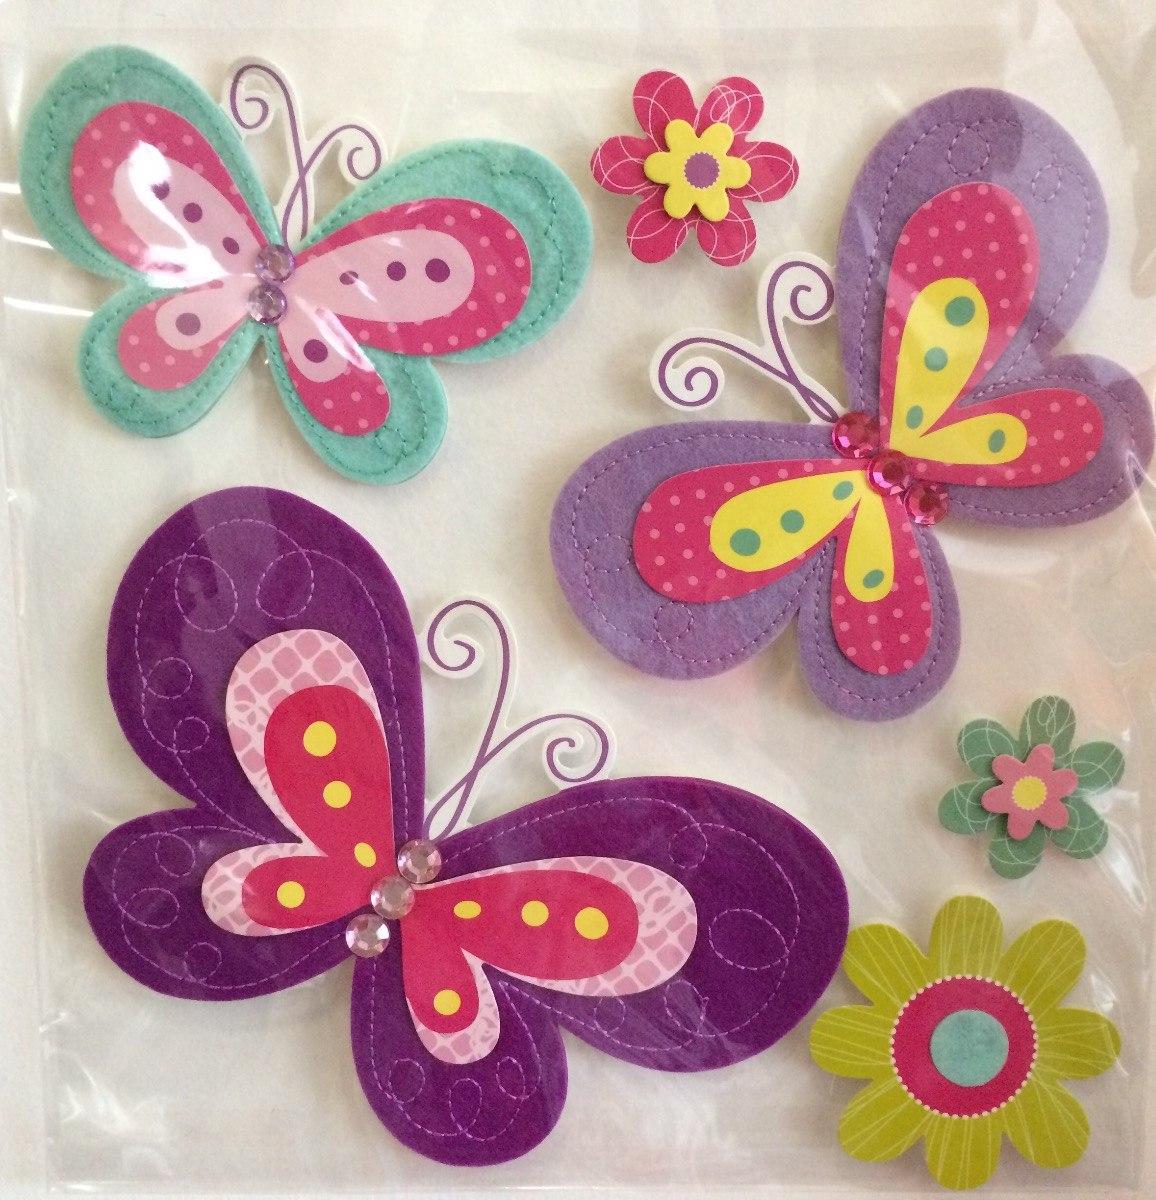 Hermosas Mariposas 3d Para Decorar Habitacion